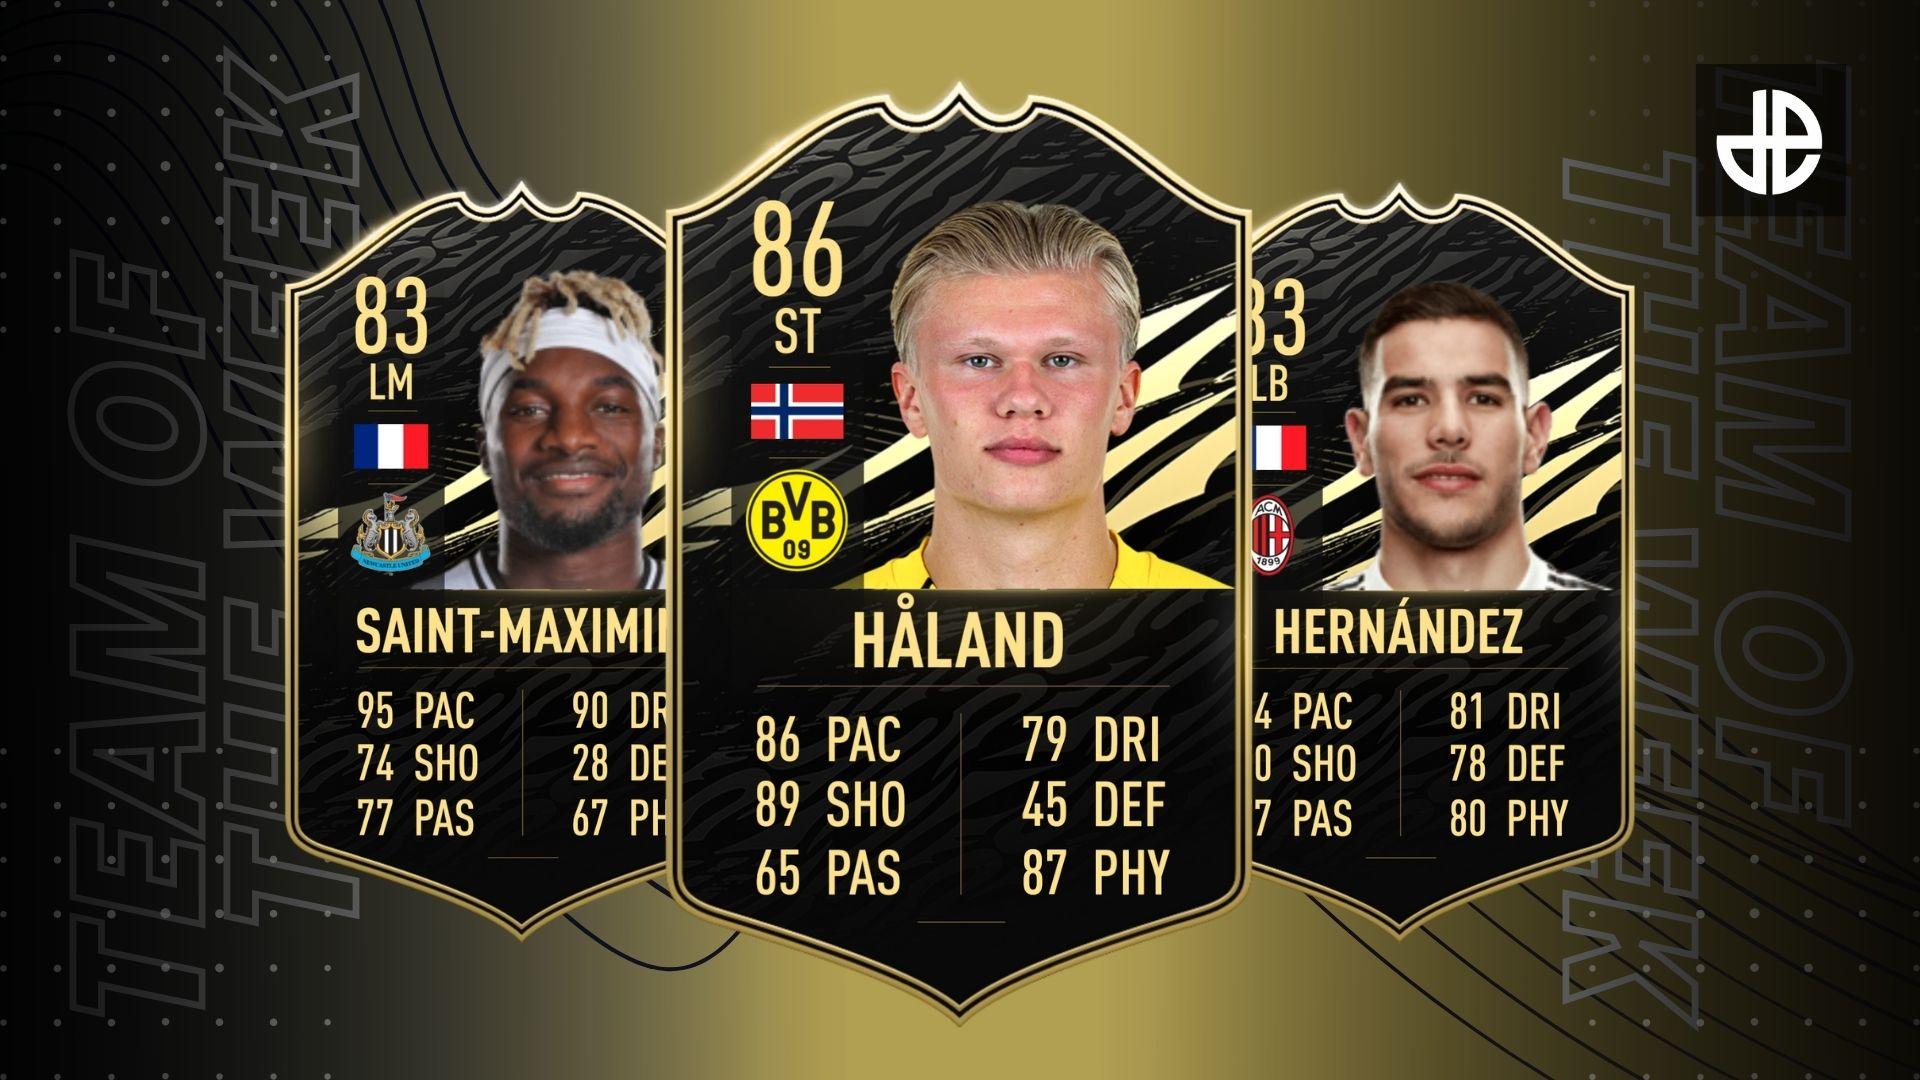 Team of the Week 2 FIFA 21